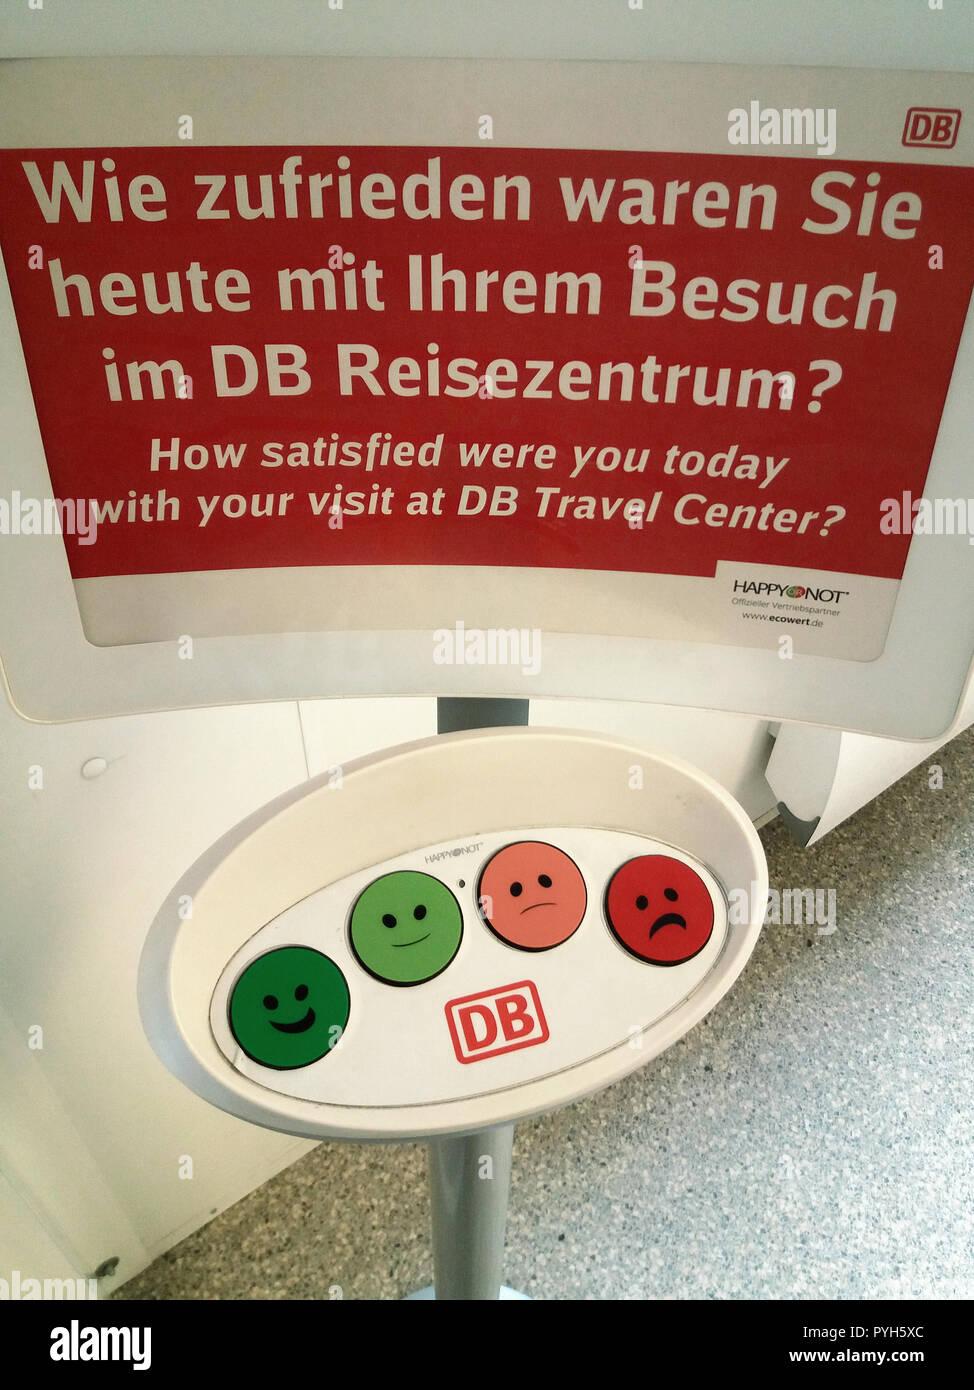 Berlin, Germany - Apparatus for customer satisfaction survey, Deutsche Bahn AG - Stock Image